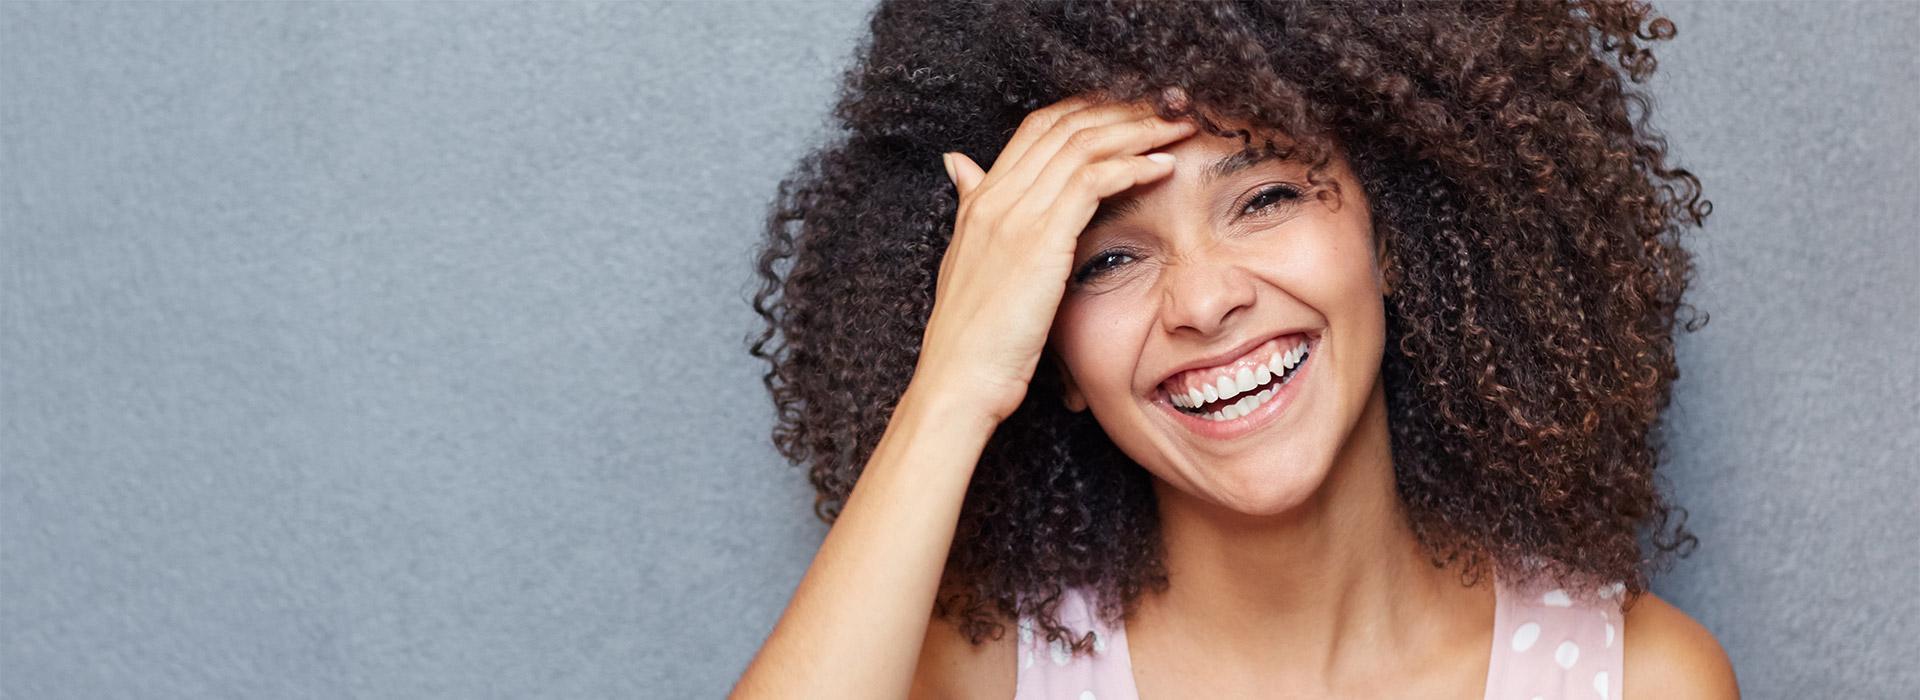 Zahnarzt Kontakt Angstpatienten Prophylaxe Zahnreinigung professionell